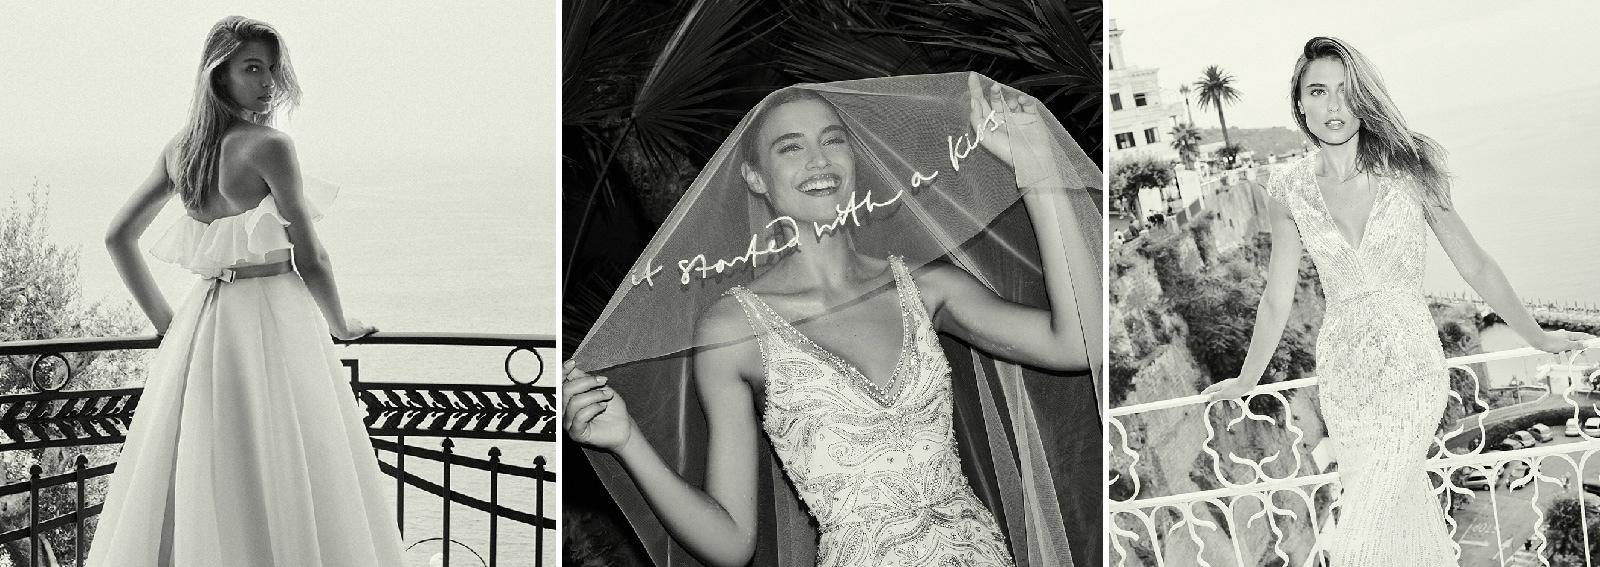 COVER-jenny-packham-sposa-2020-DESKTOP